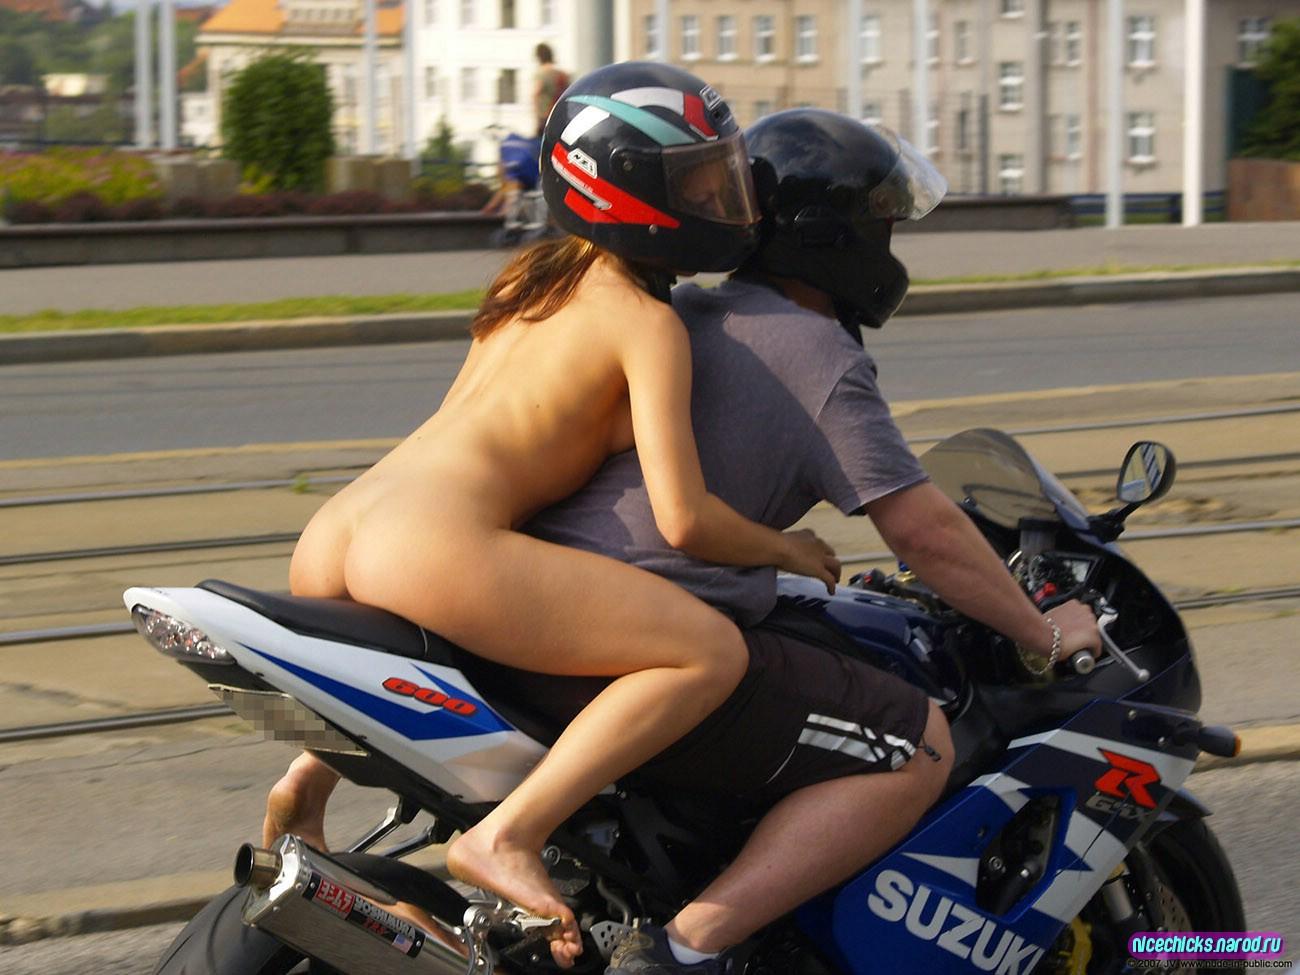 Толстуха на мотоцикле 8 фотография